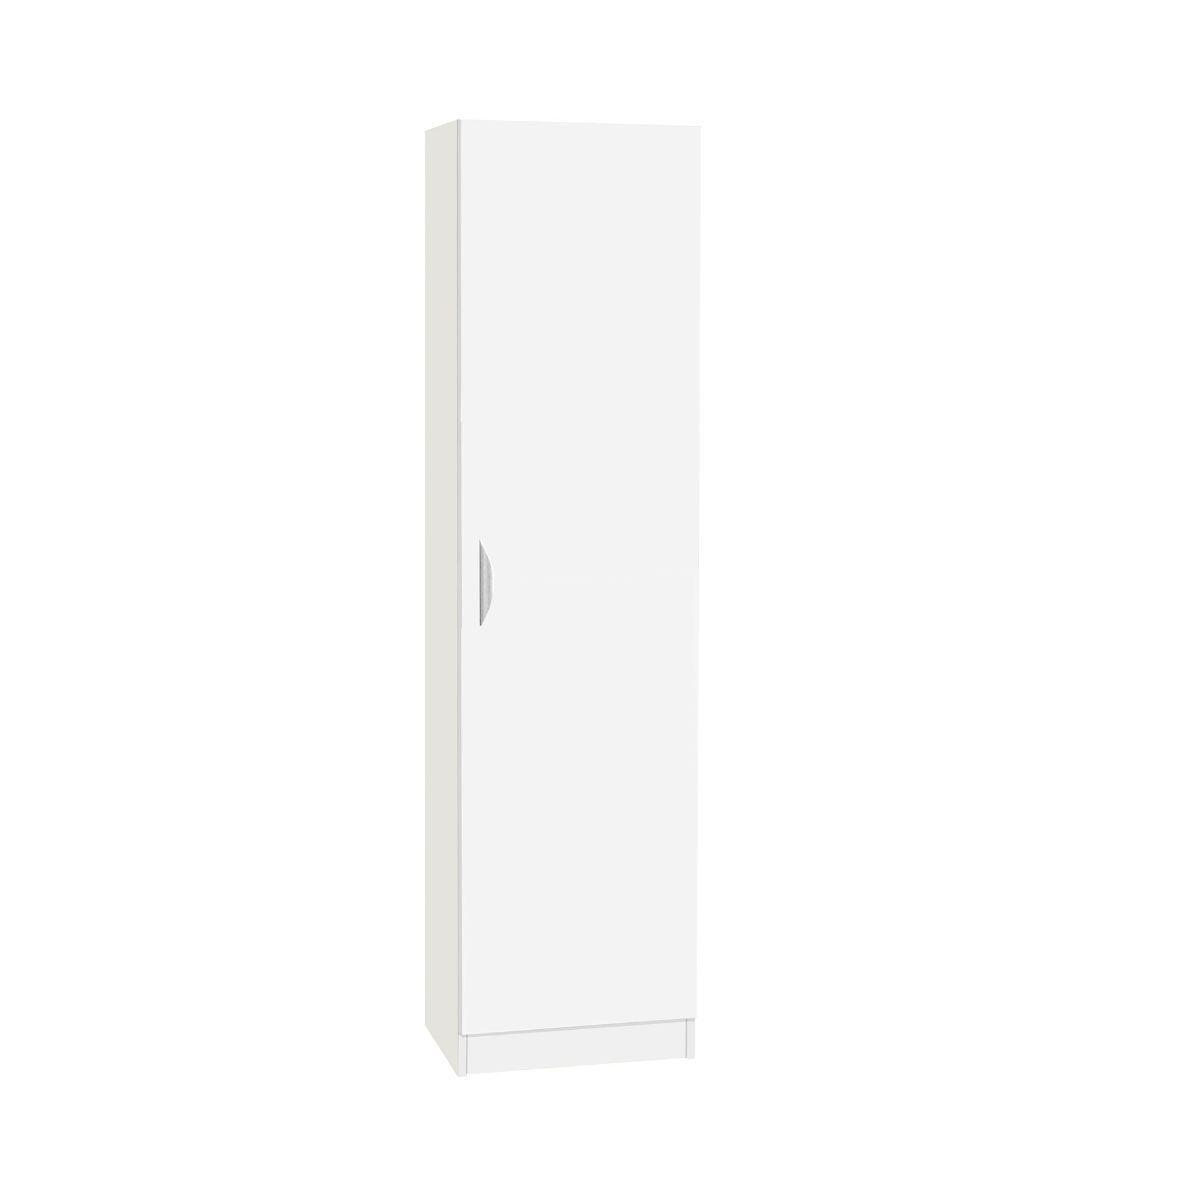 R White Tall Cupboard Storage White White